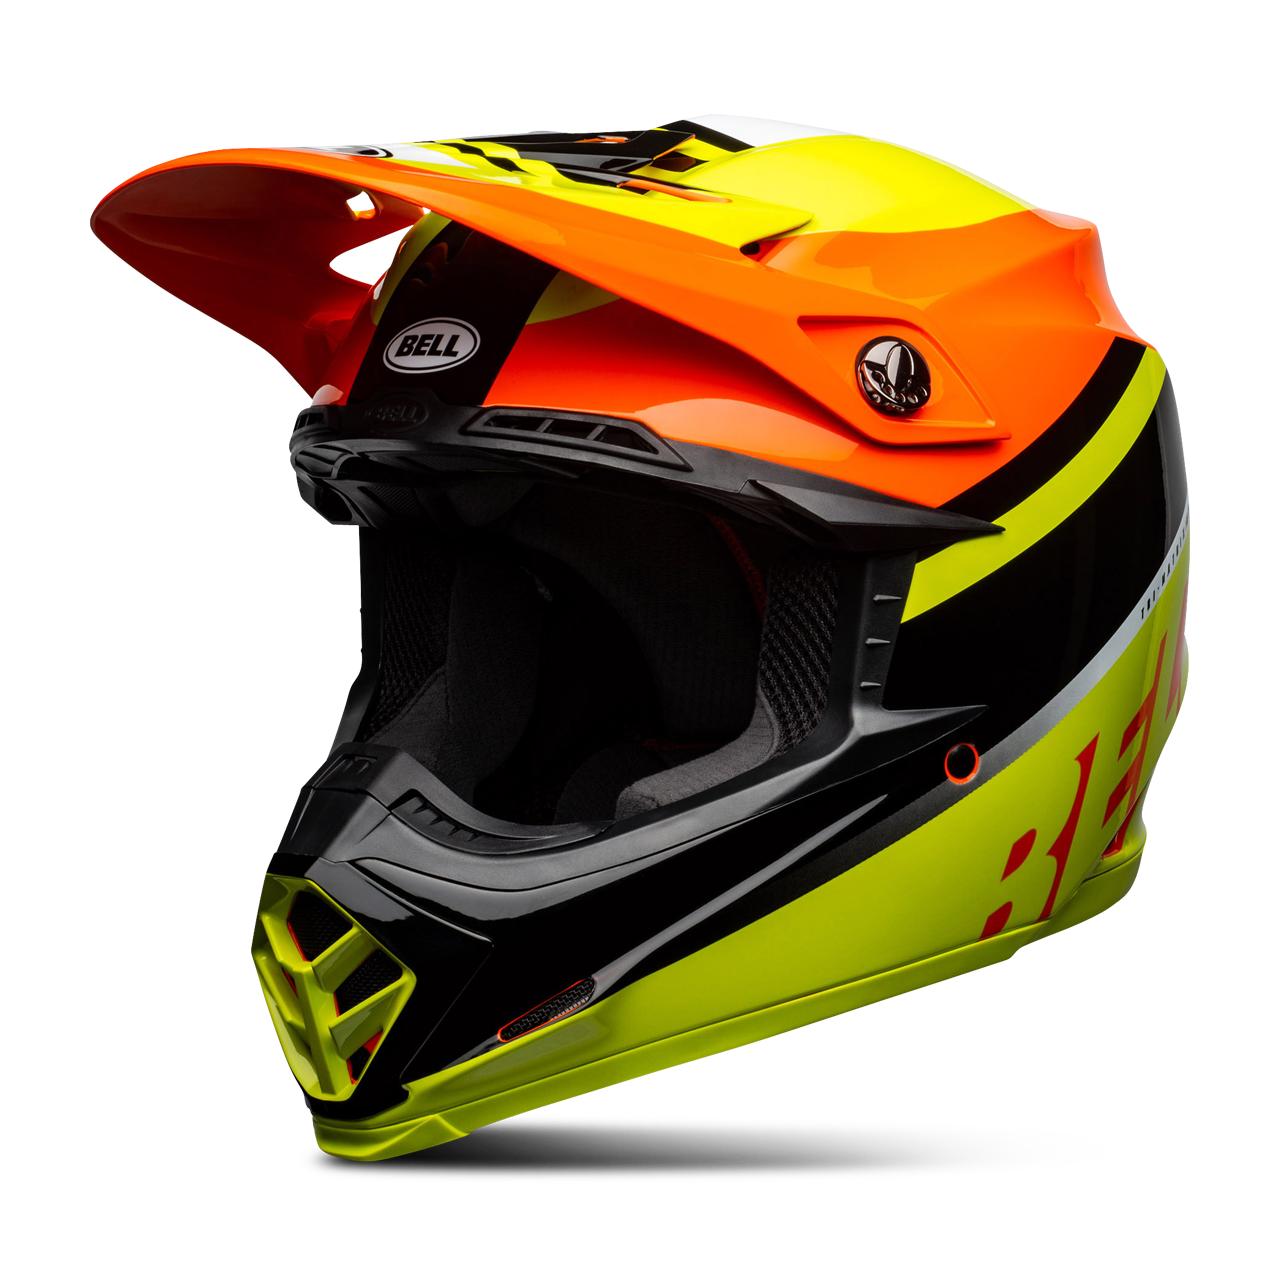 bell casco cross  moto-9 mips prophecy giallo-arancio-nero